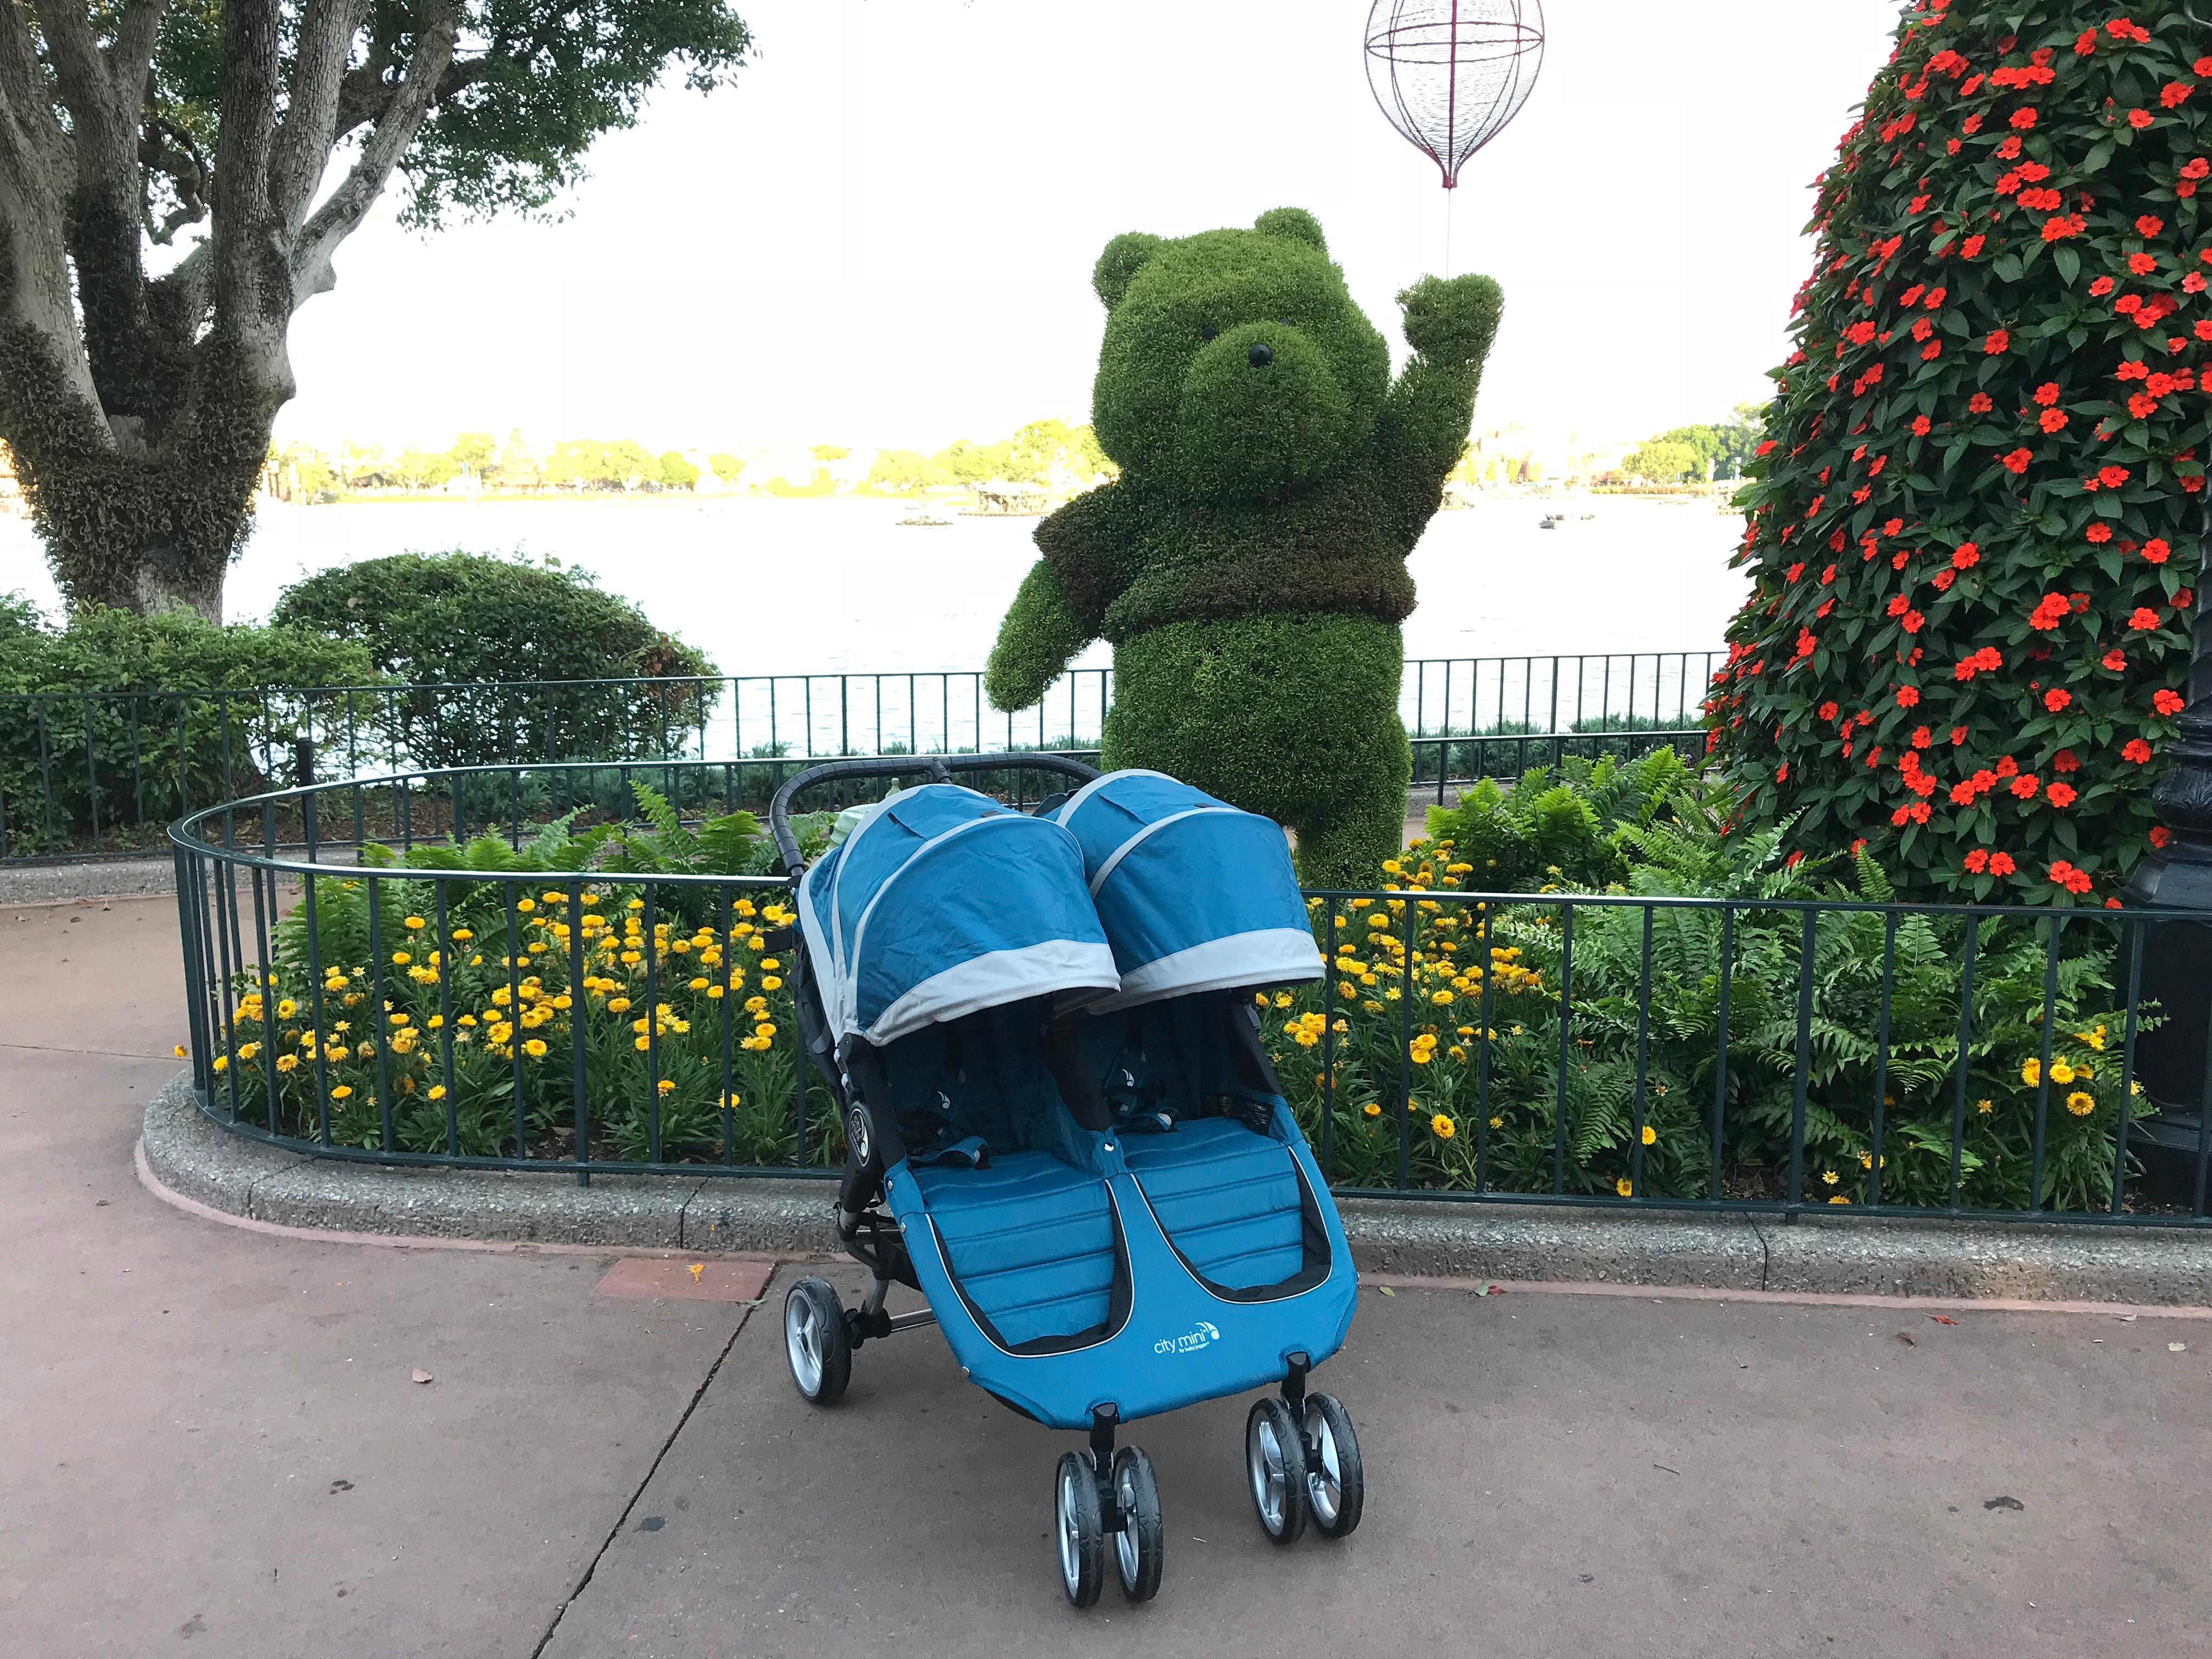 Stroller Rentals Disney image 49